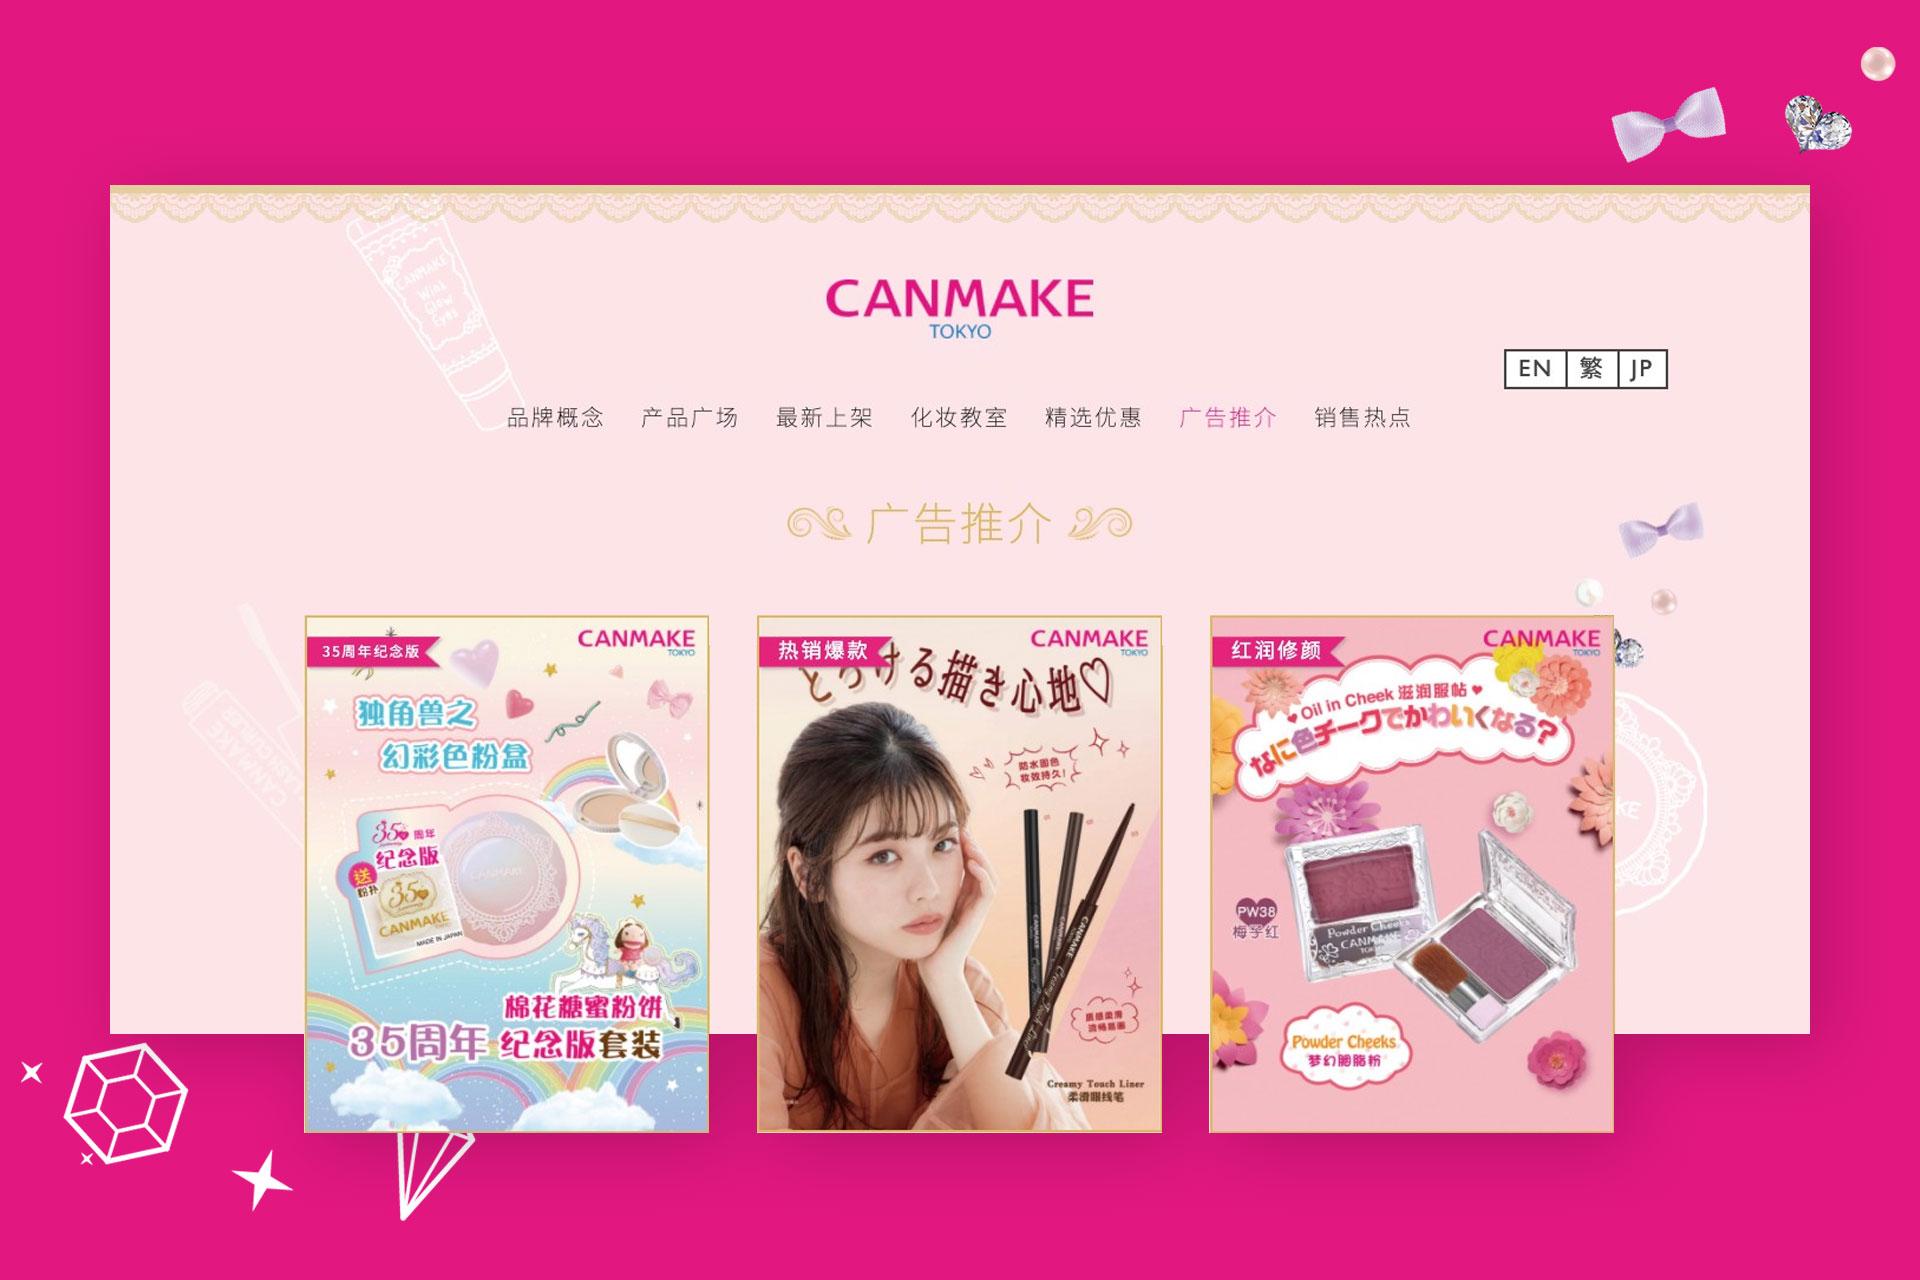 canmake-sc-detailpage-02.jpg